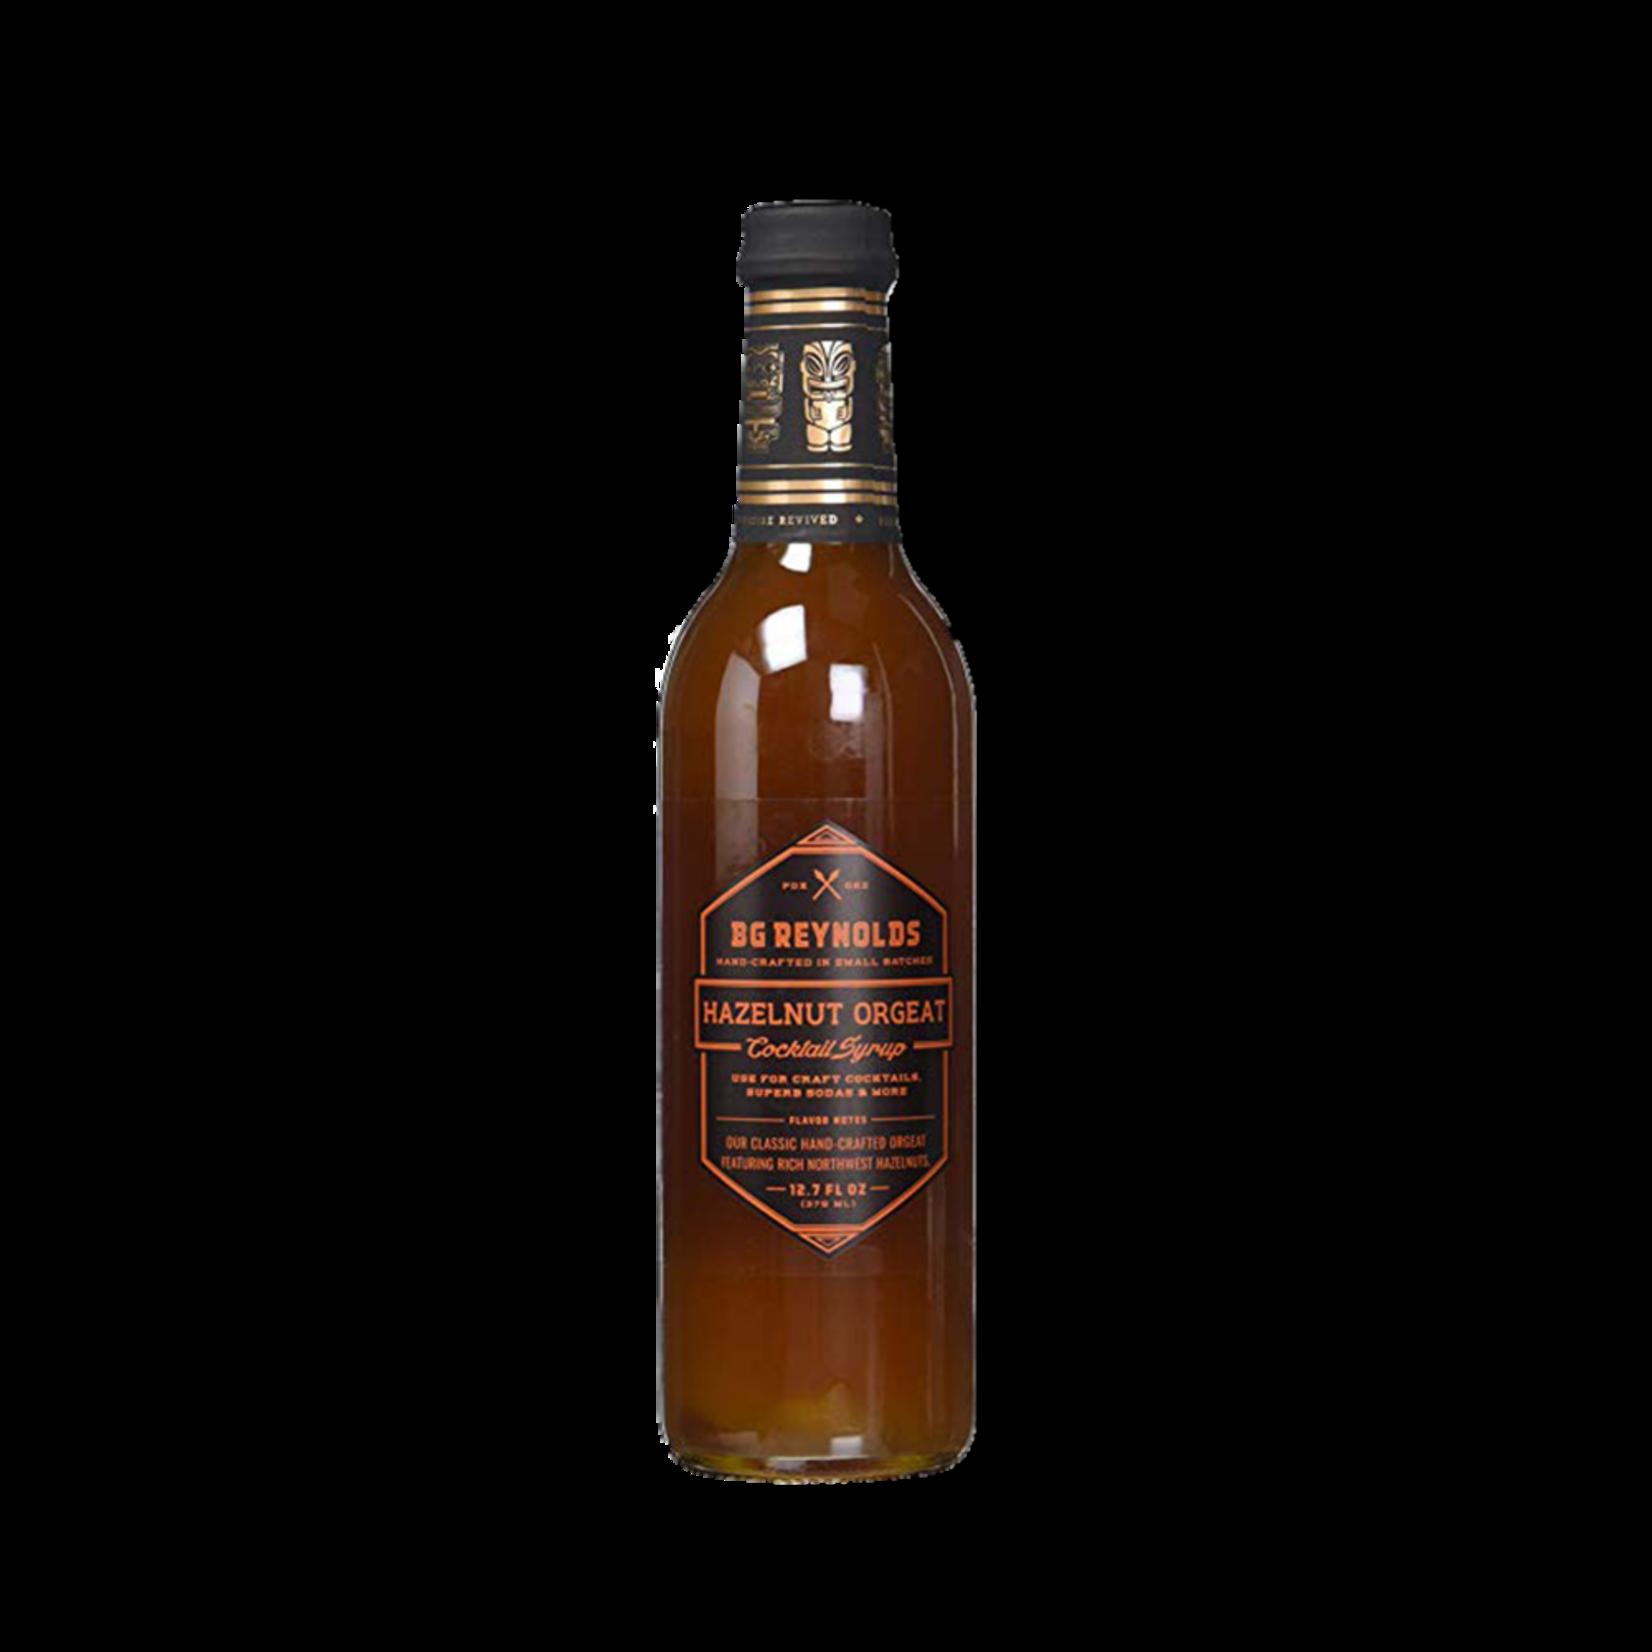 BG Reynolds Syrup Hazelnut Orgeat 375ml